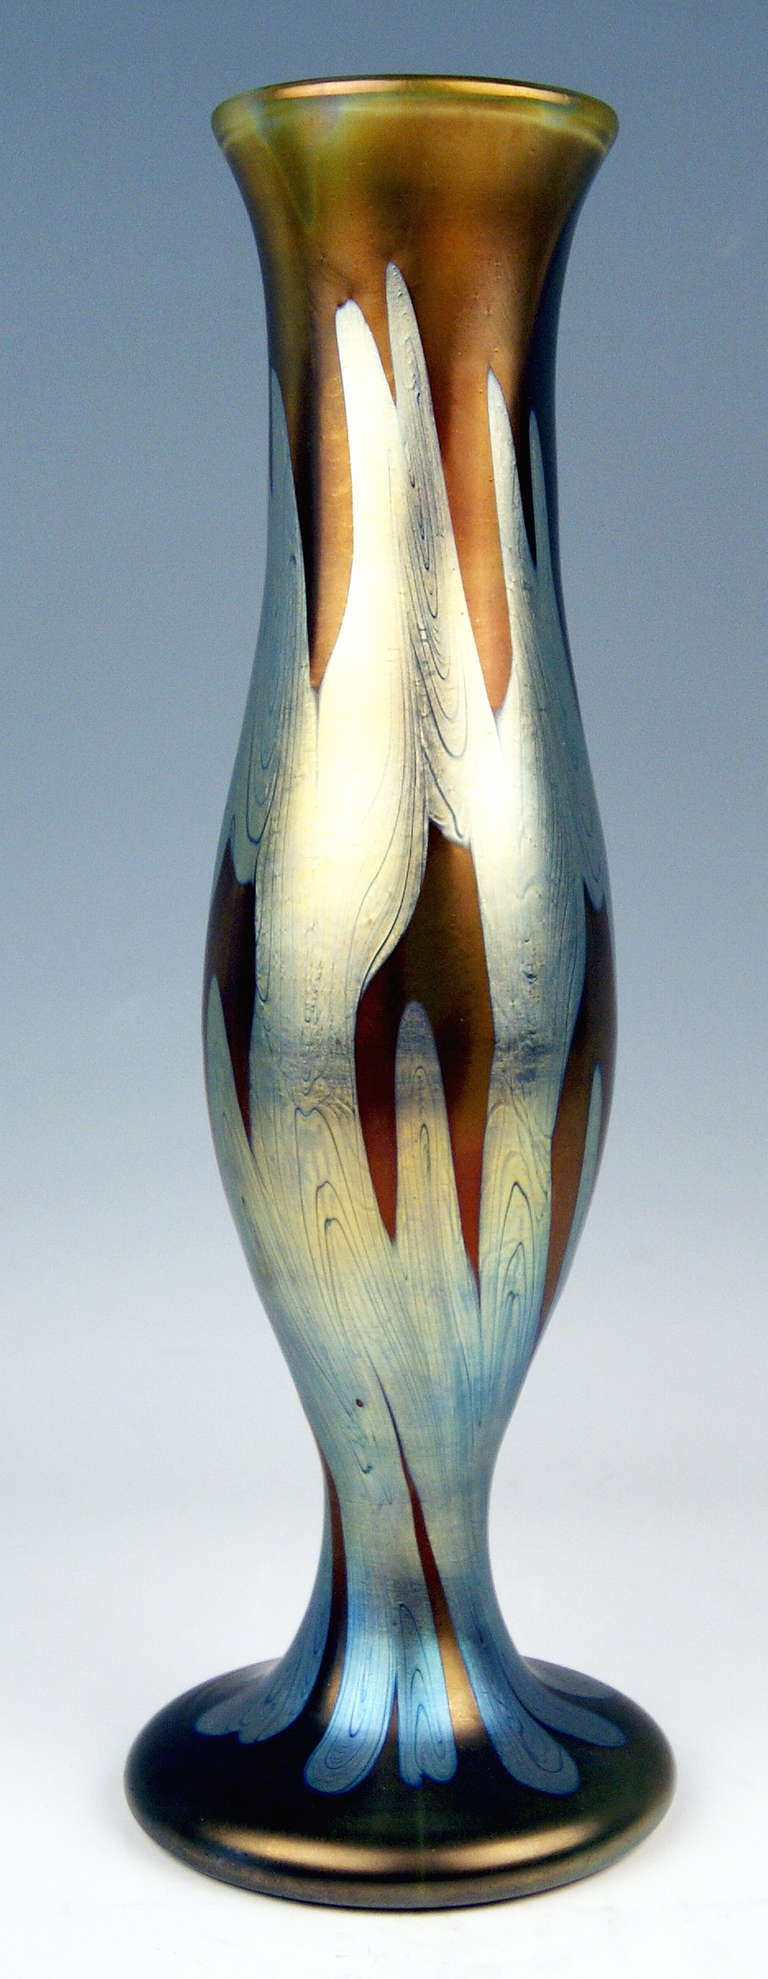 Vase Loetz Widow Klostermuehle Bohemia Art Nouveau Decor PG 29     13.2  inches 2